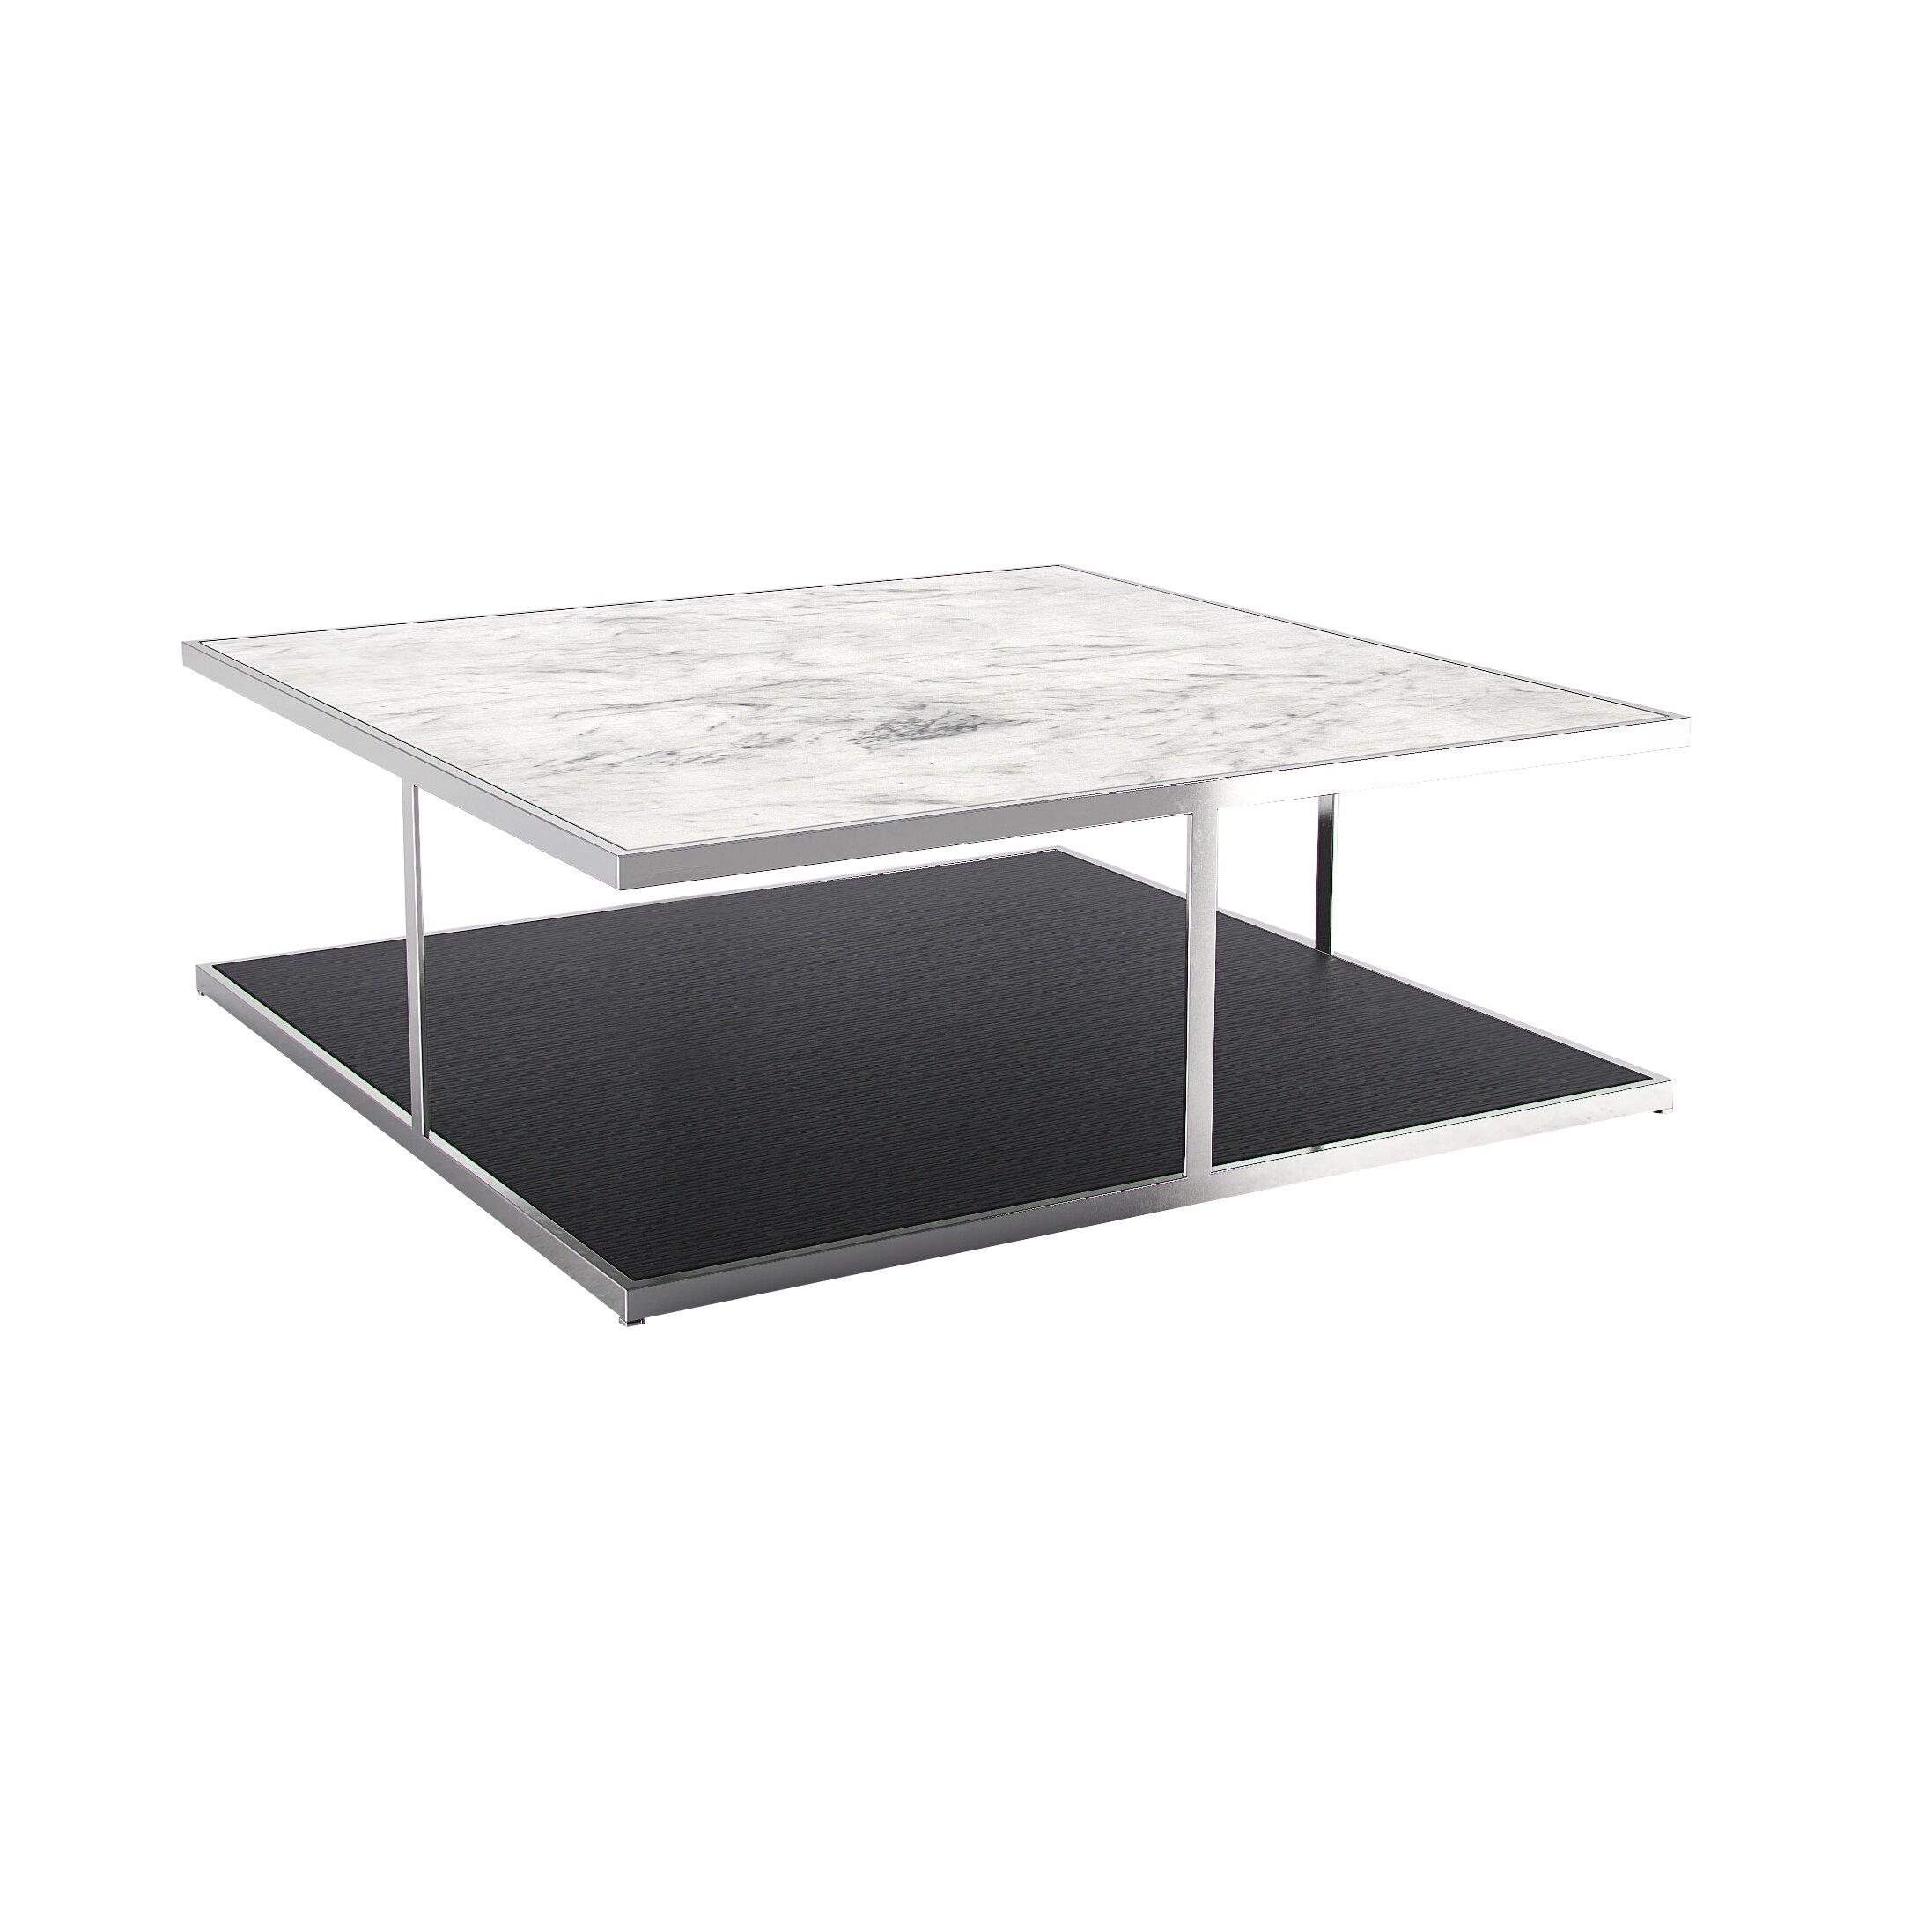 Modloft Ann Coffee Table Reviews Wayfair